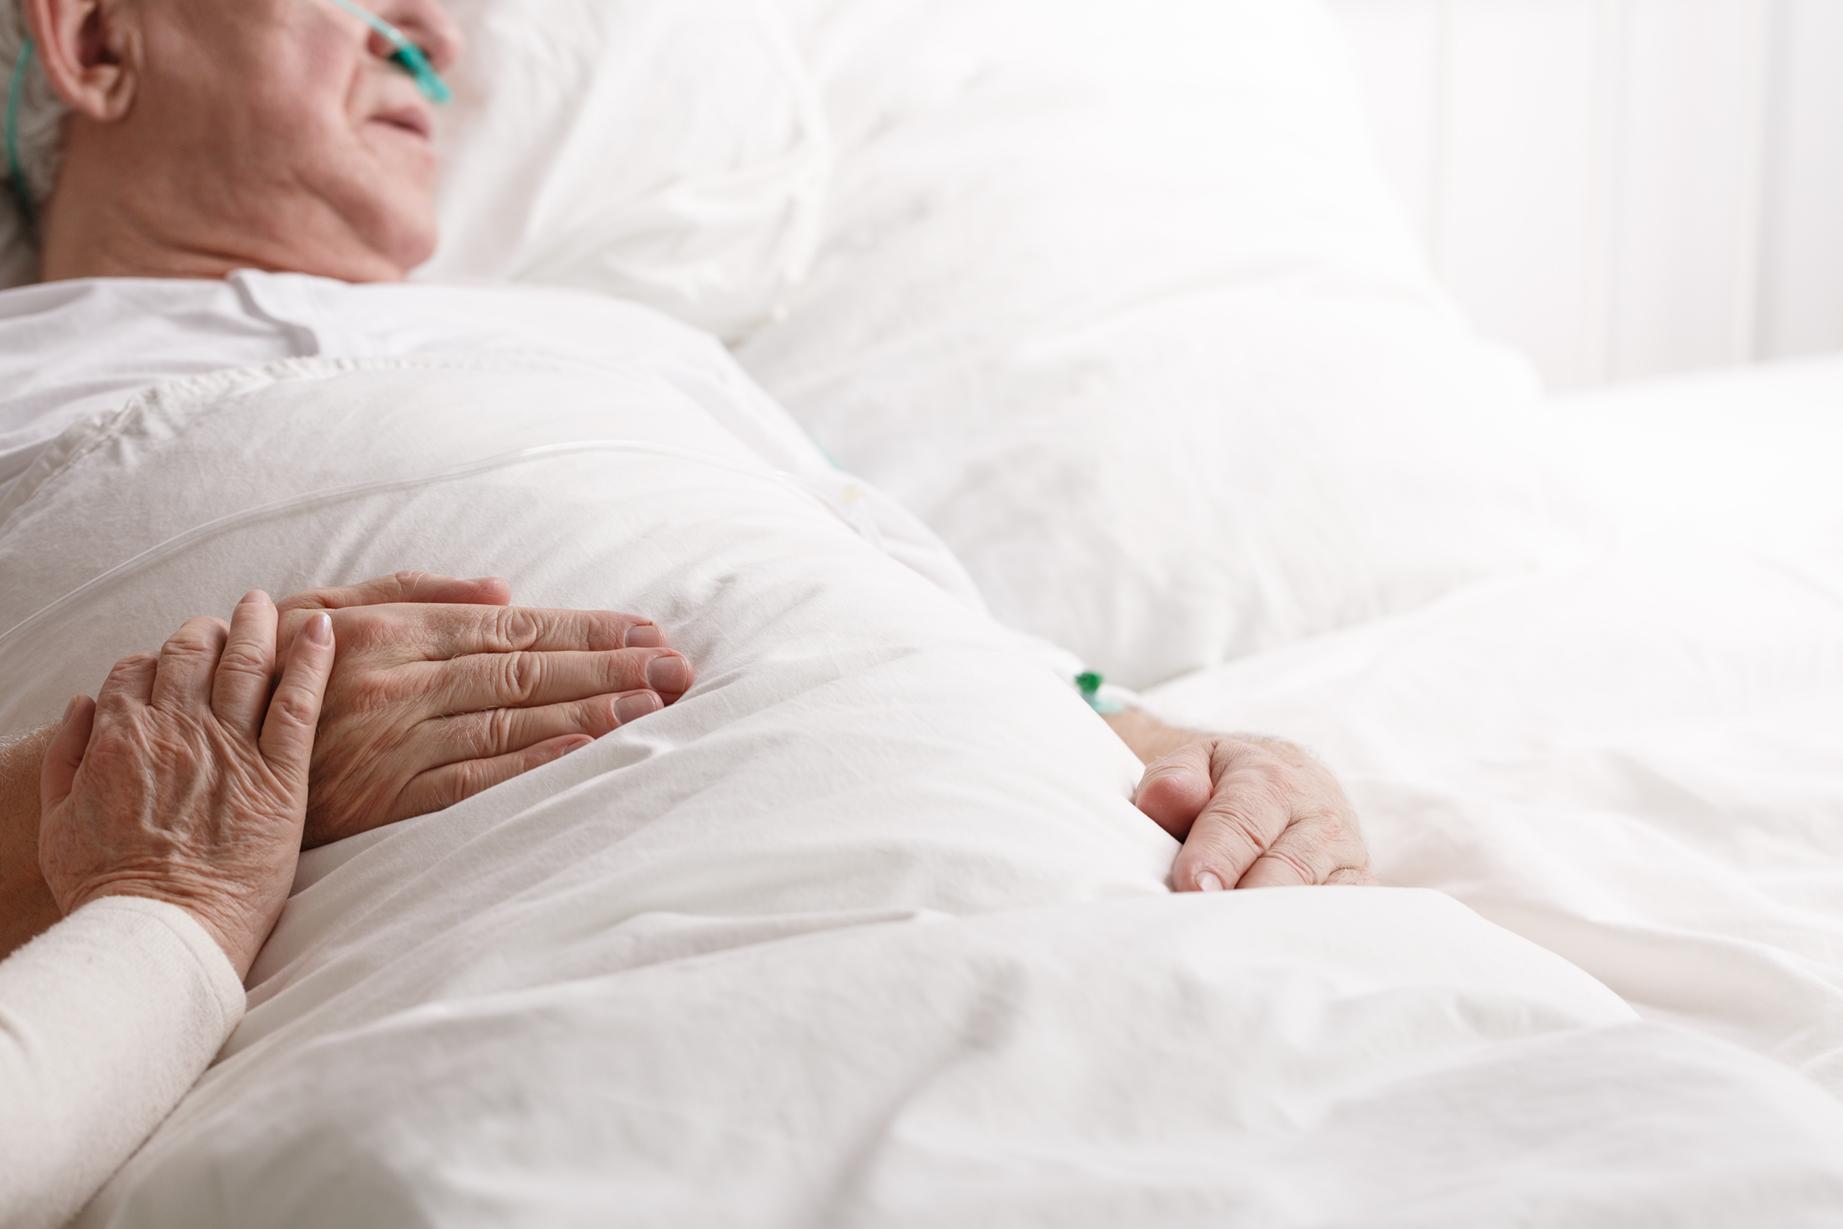 Patient lies in hospital bed.